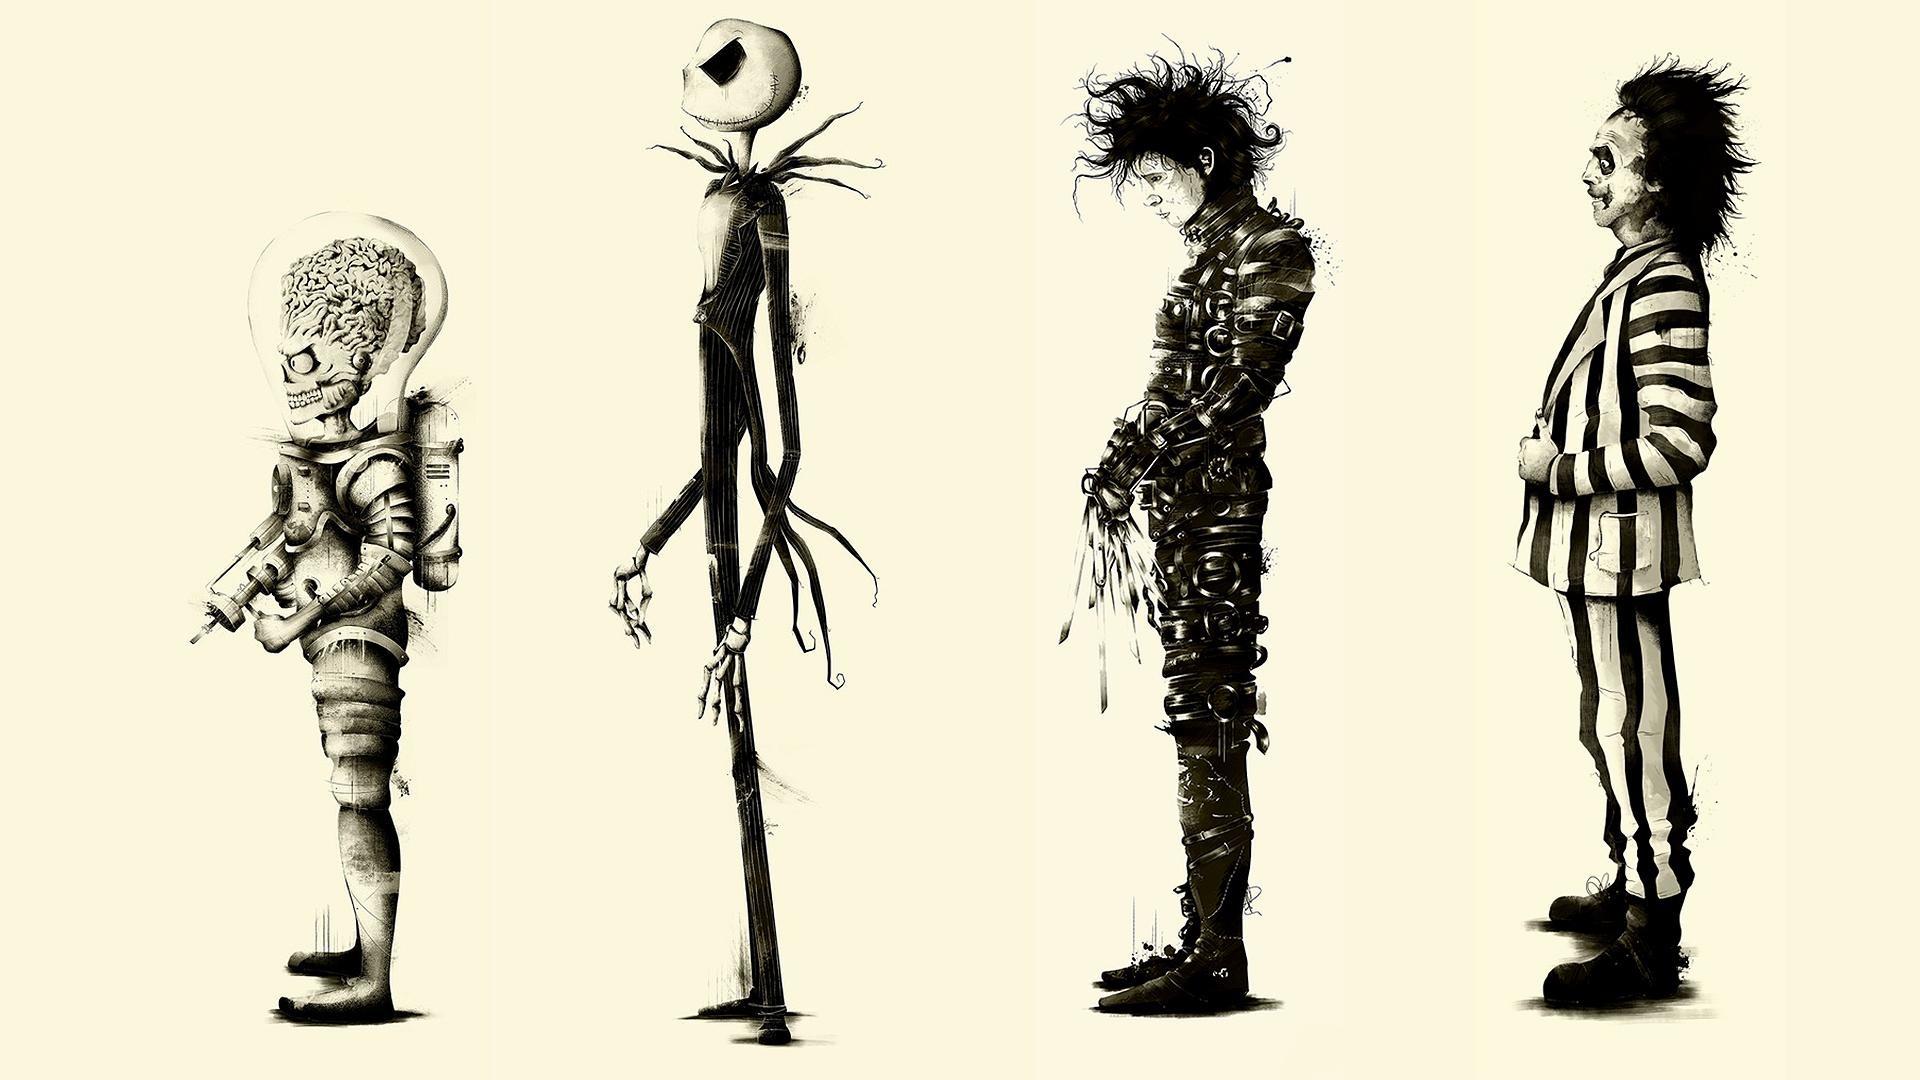 Jacck-skellington-beetlejuice-edward-scissorhands-fan-art-mars-